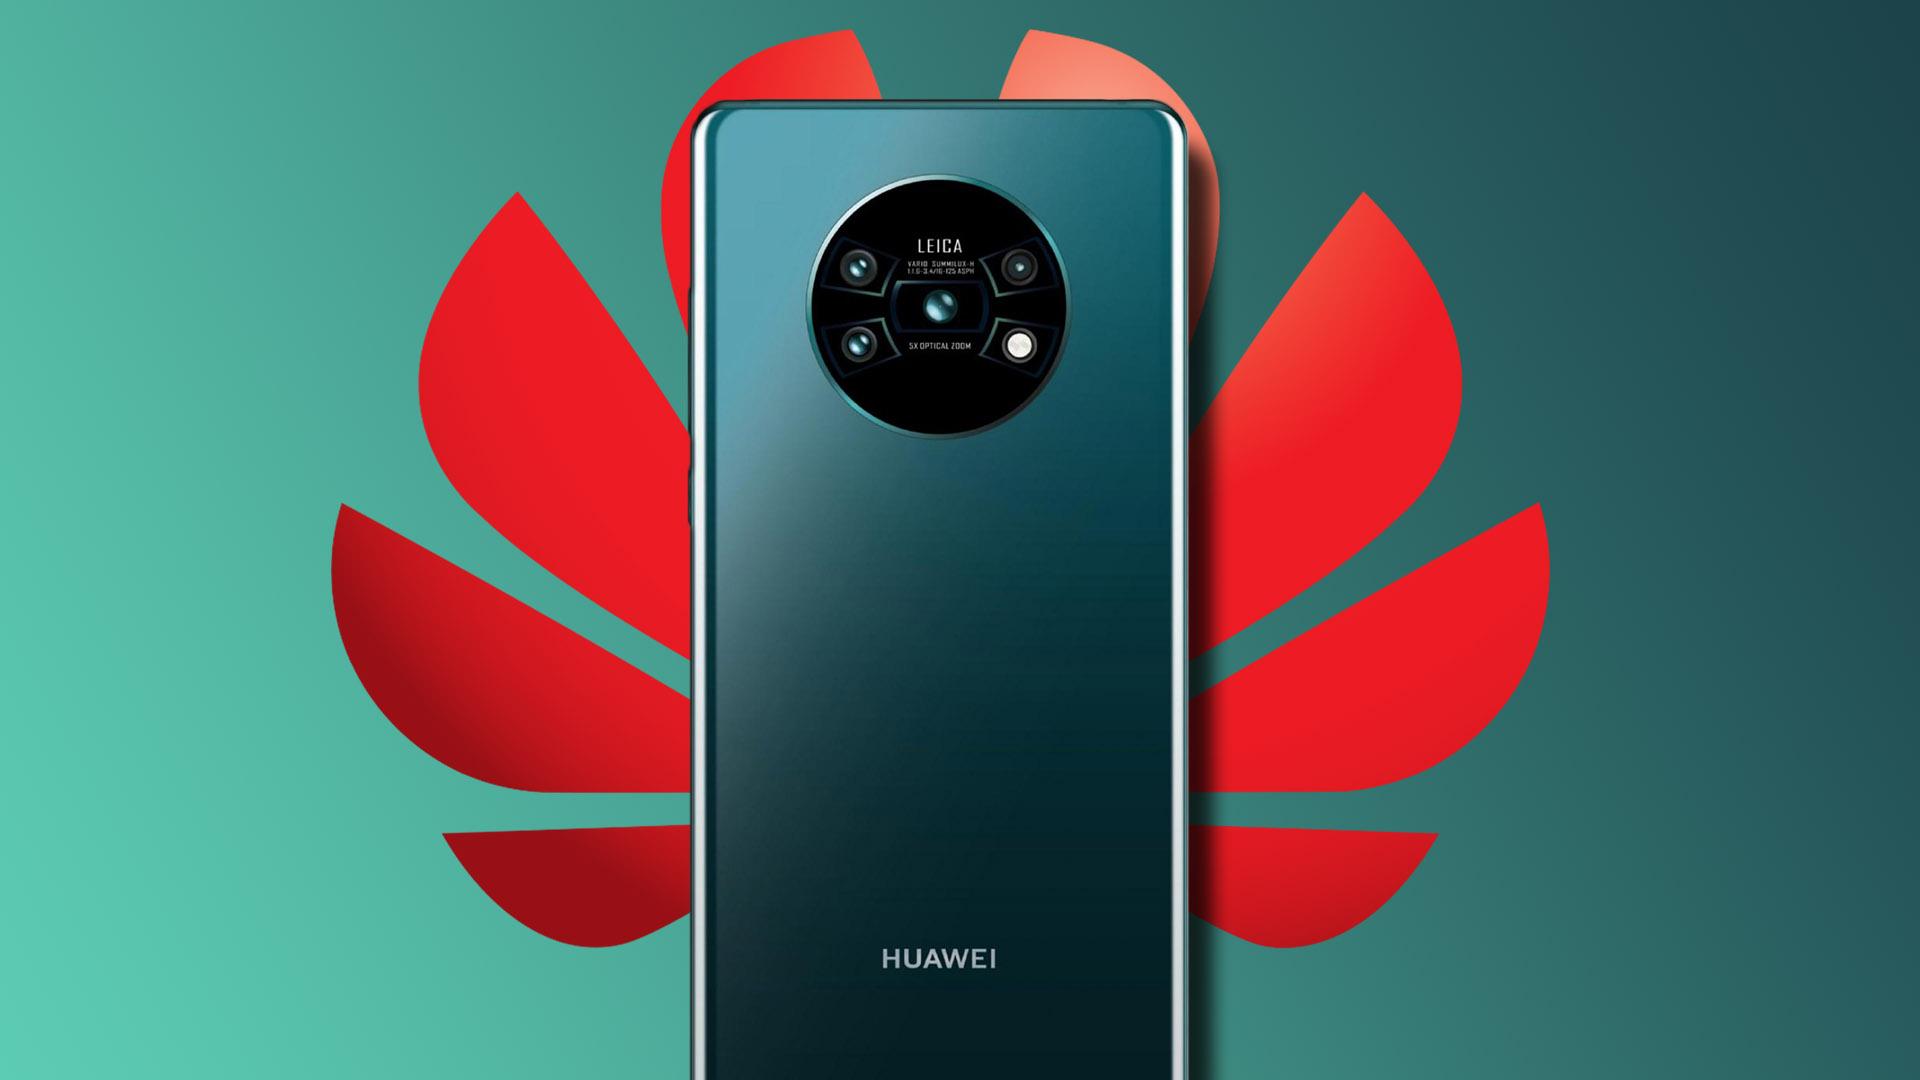 huawei mate 30 pro | cine lens camera matrix trademarks